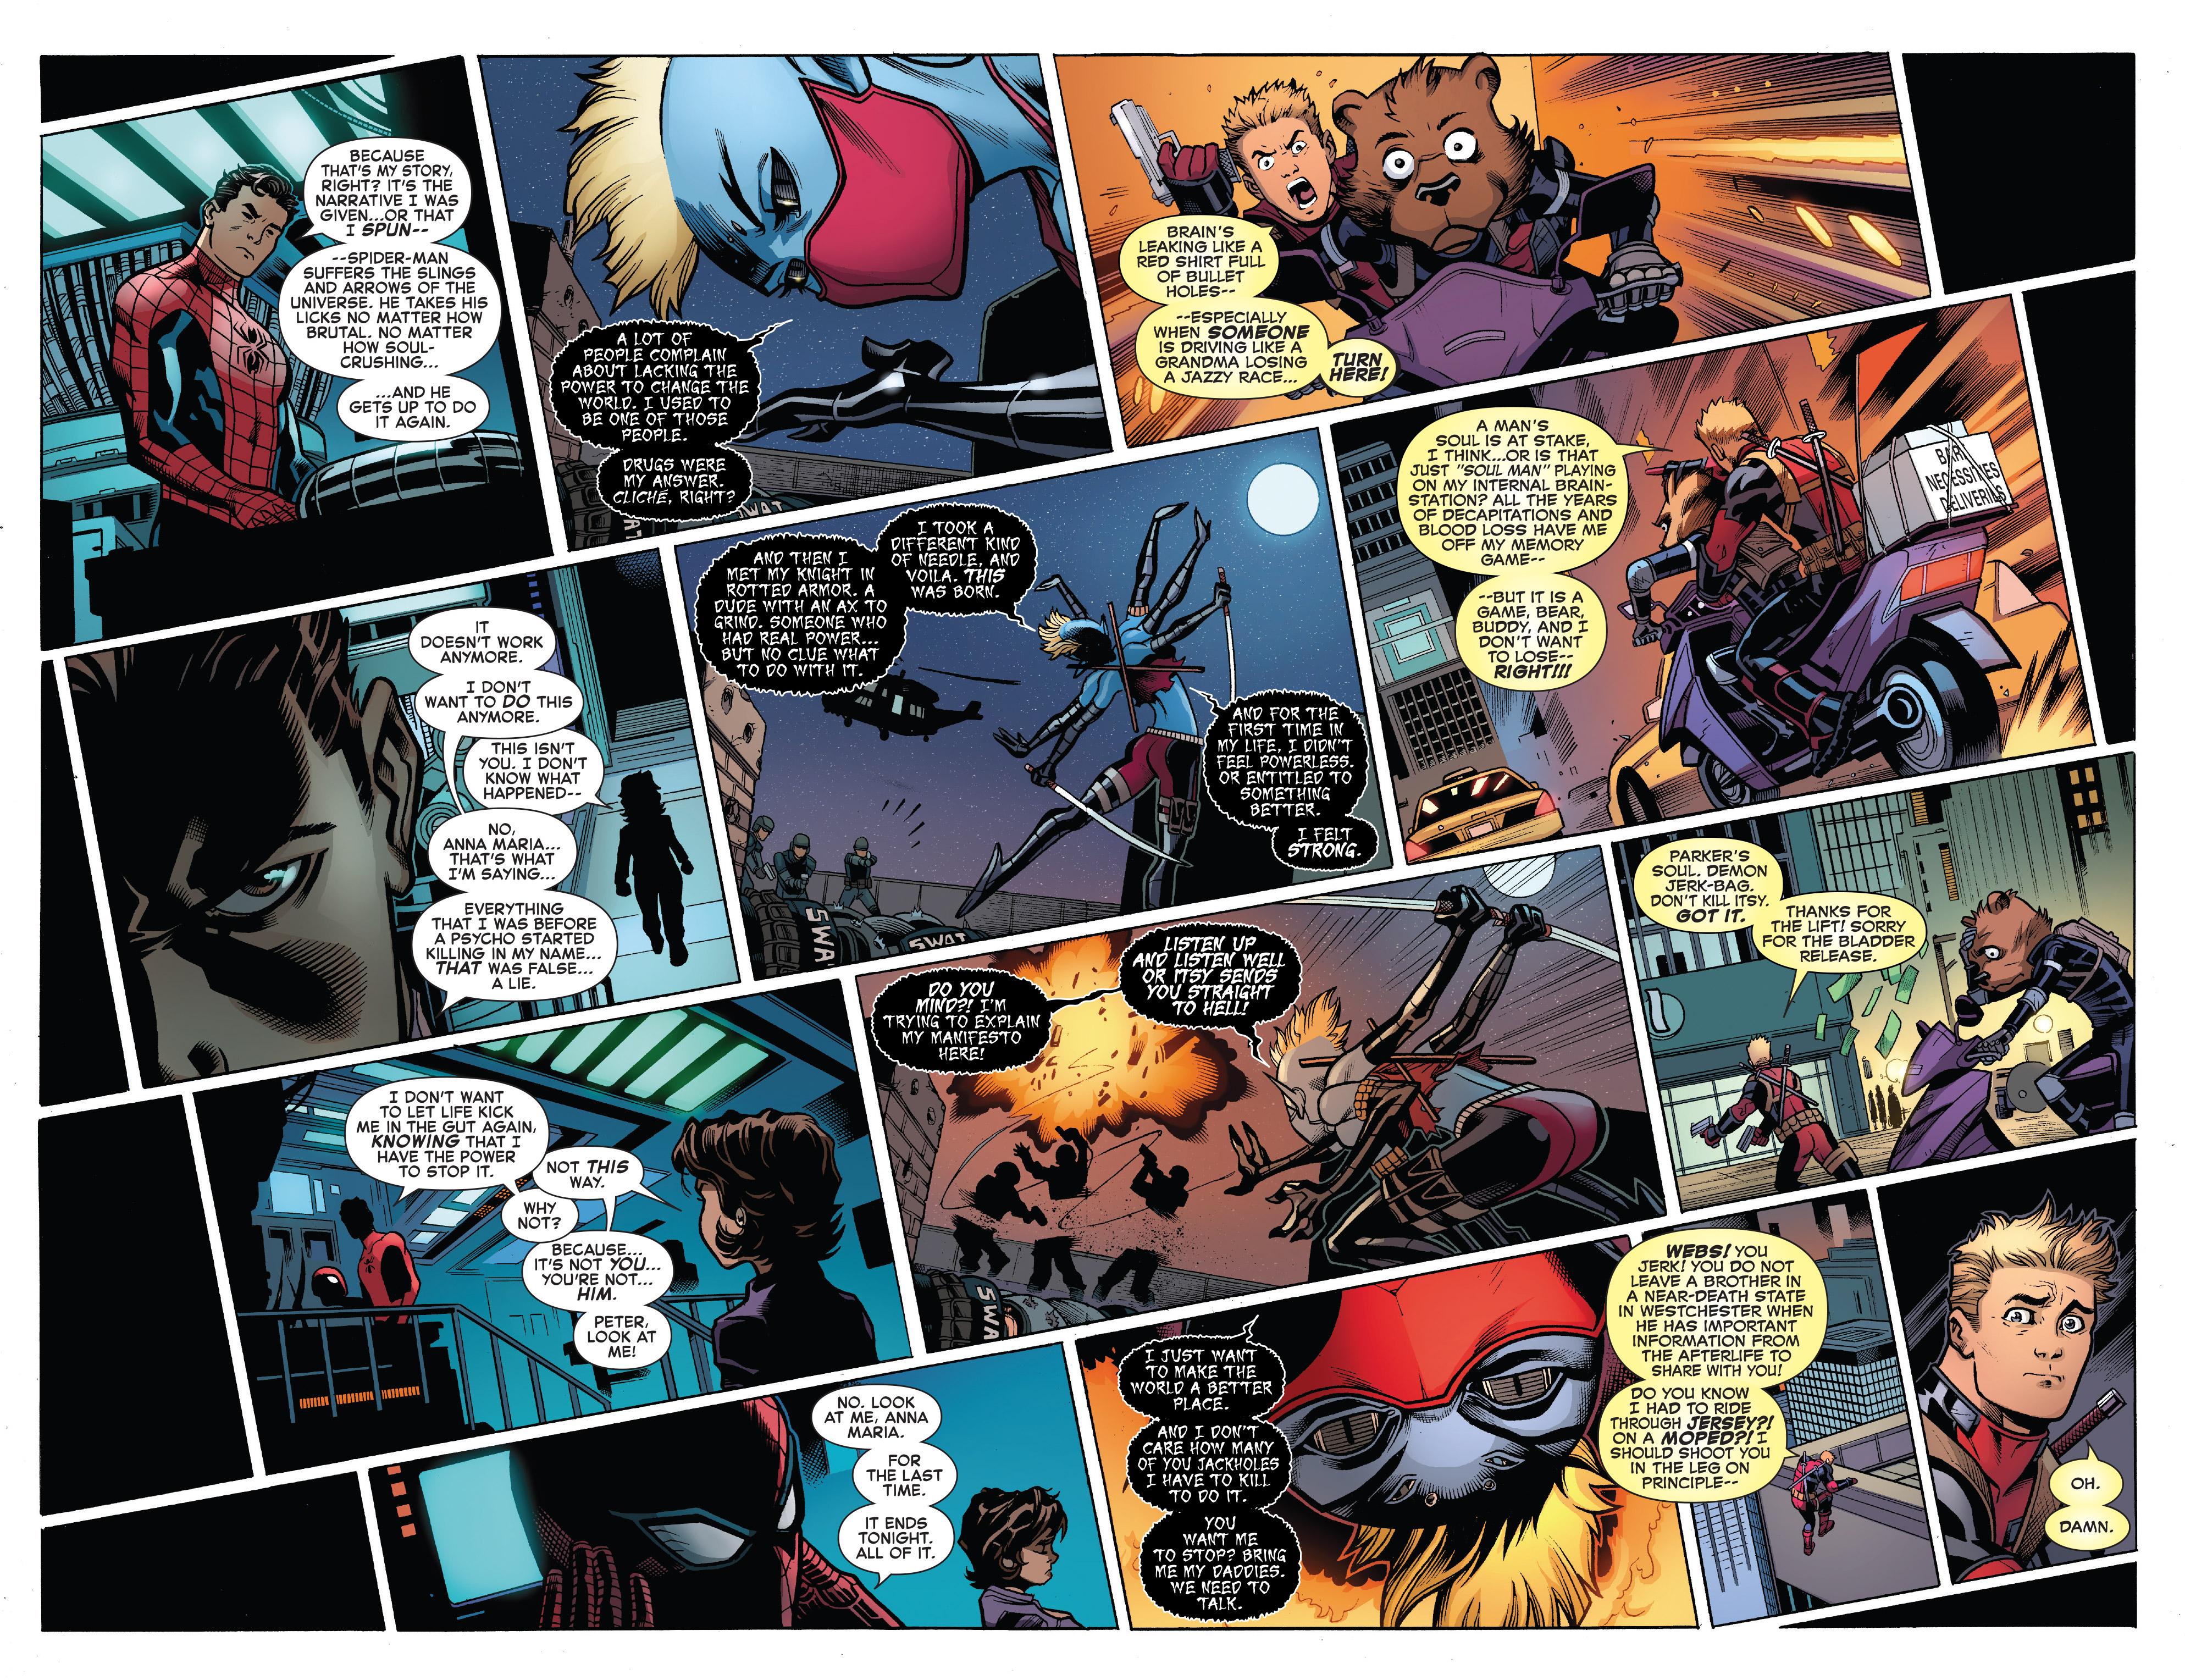 Read online Spider-Man/Deadpool comic -  Issue #17 - 4